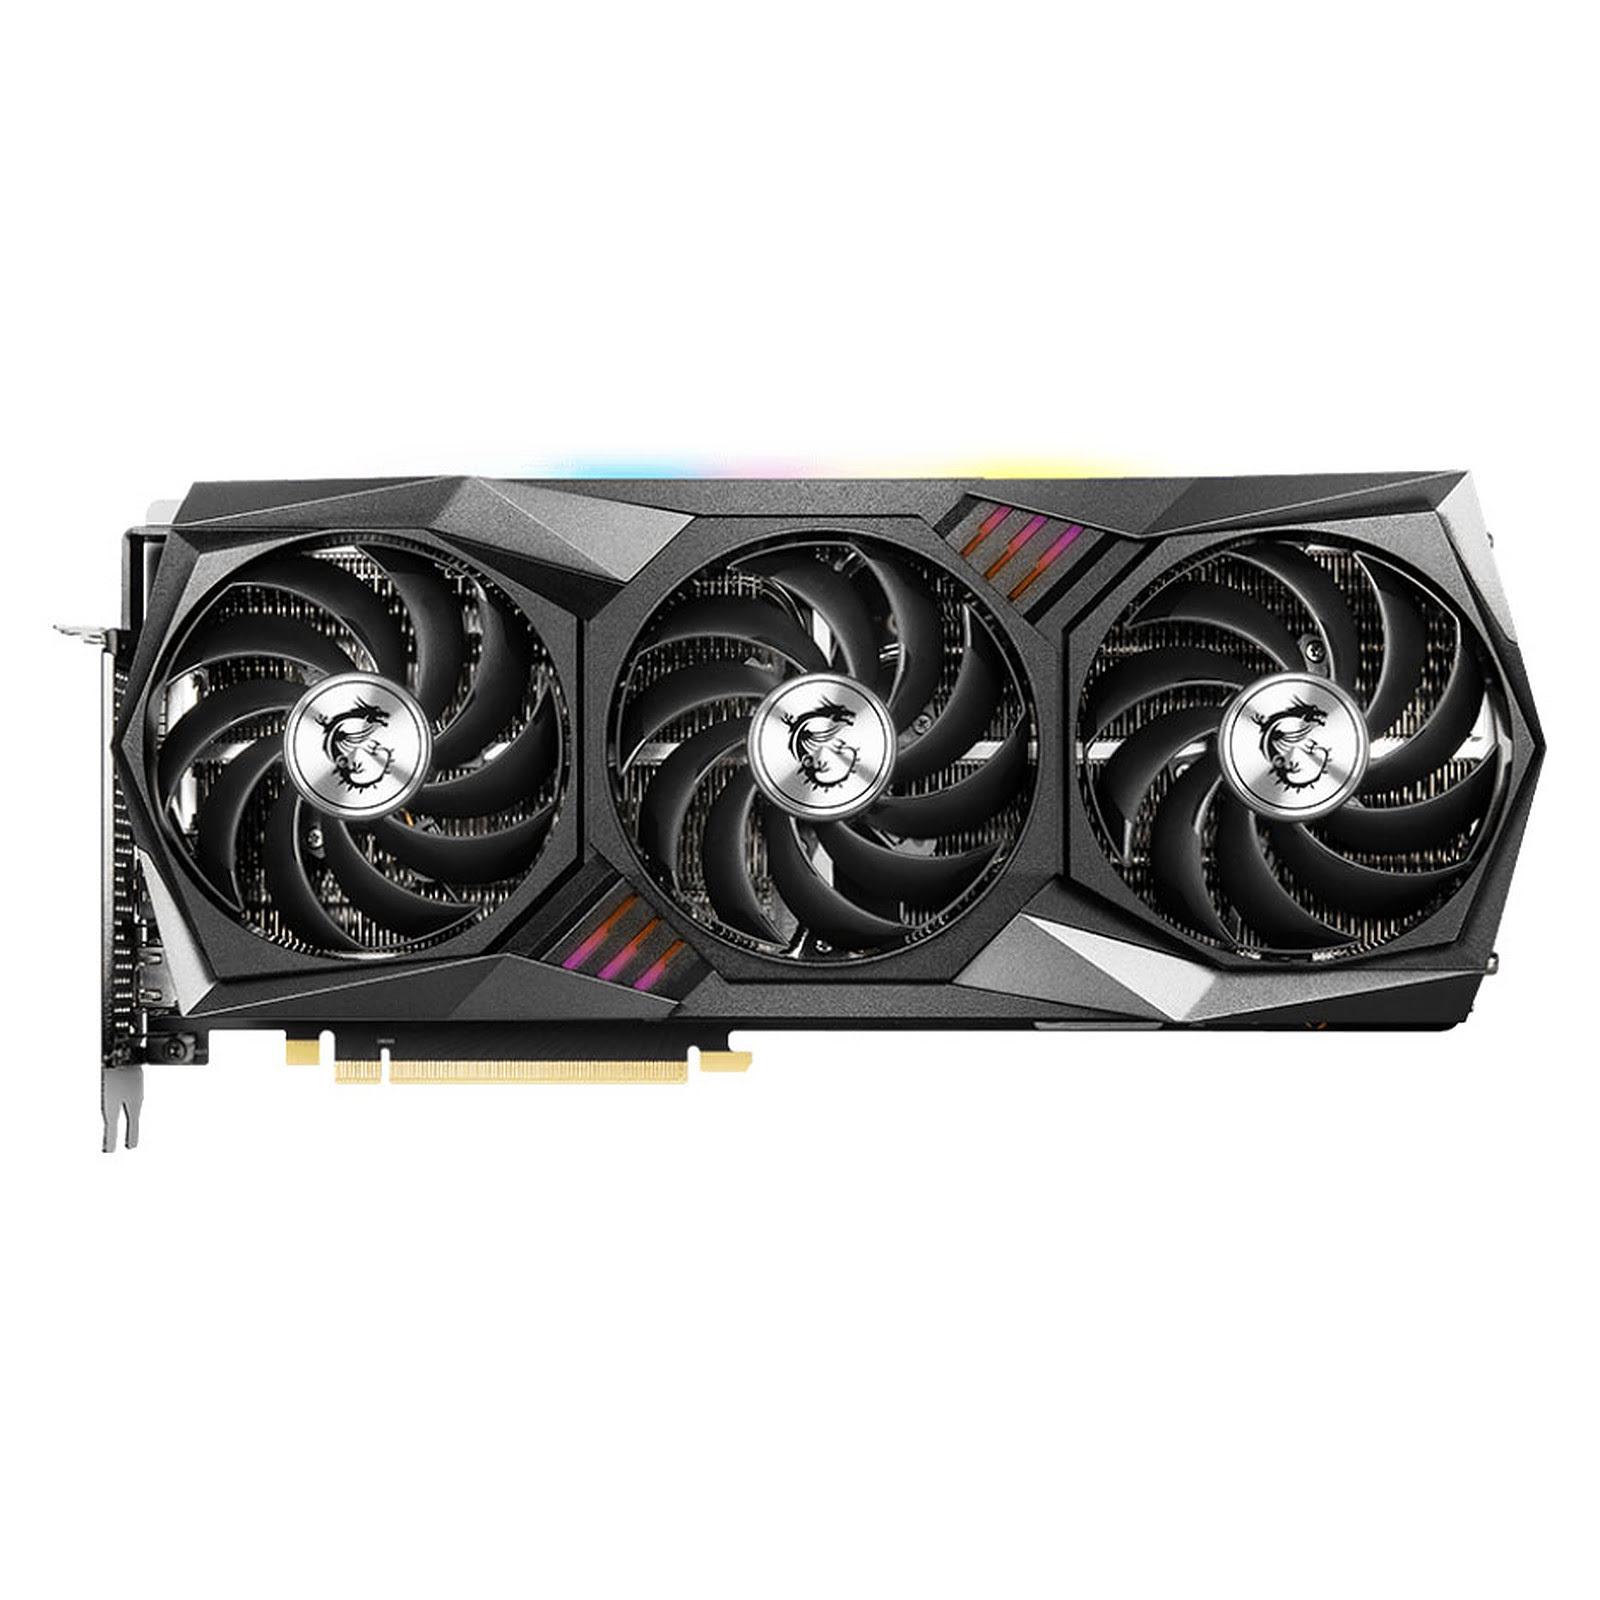 GeForce RTX 3080 GAMING Z TRIO 10G LHR (912-V389-205) - Achat / Vente Carte graphique sur Picata.fr - 4